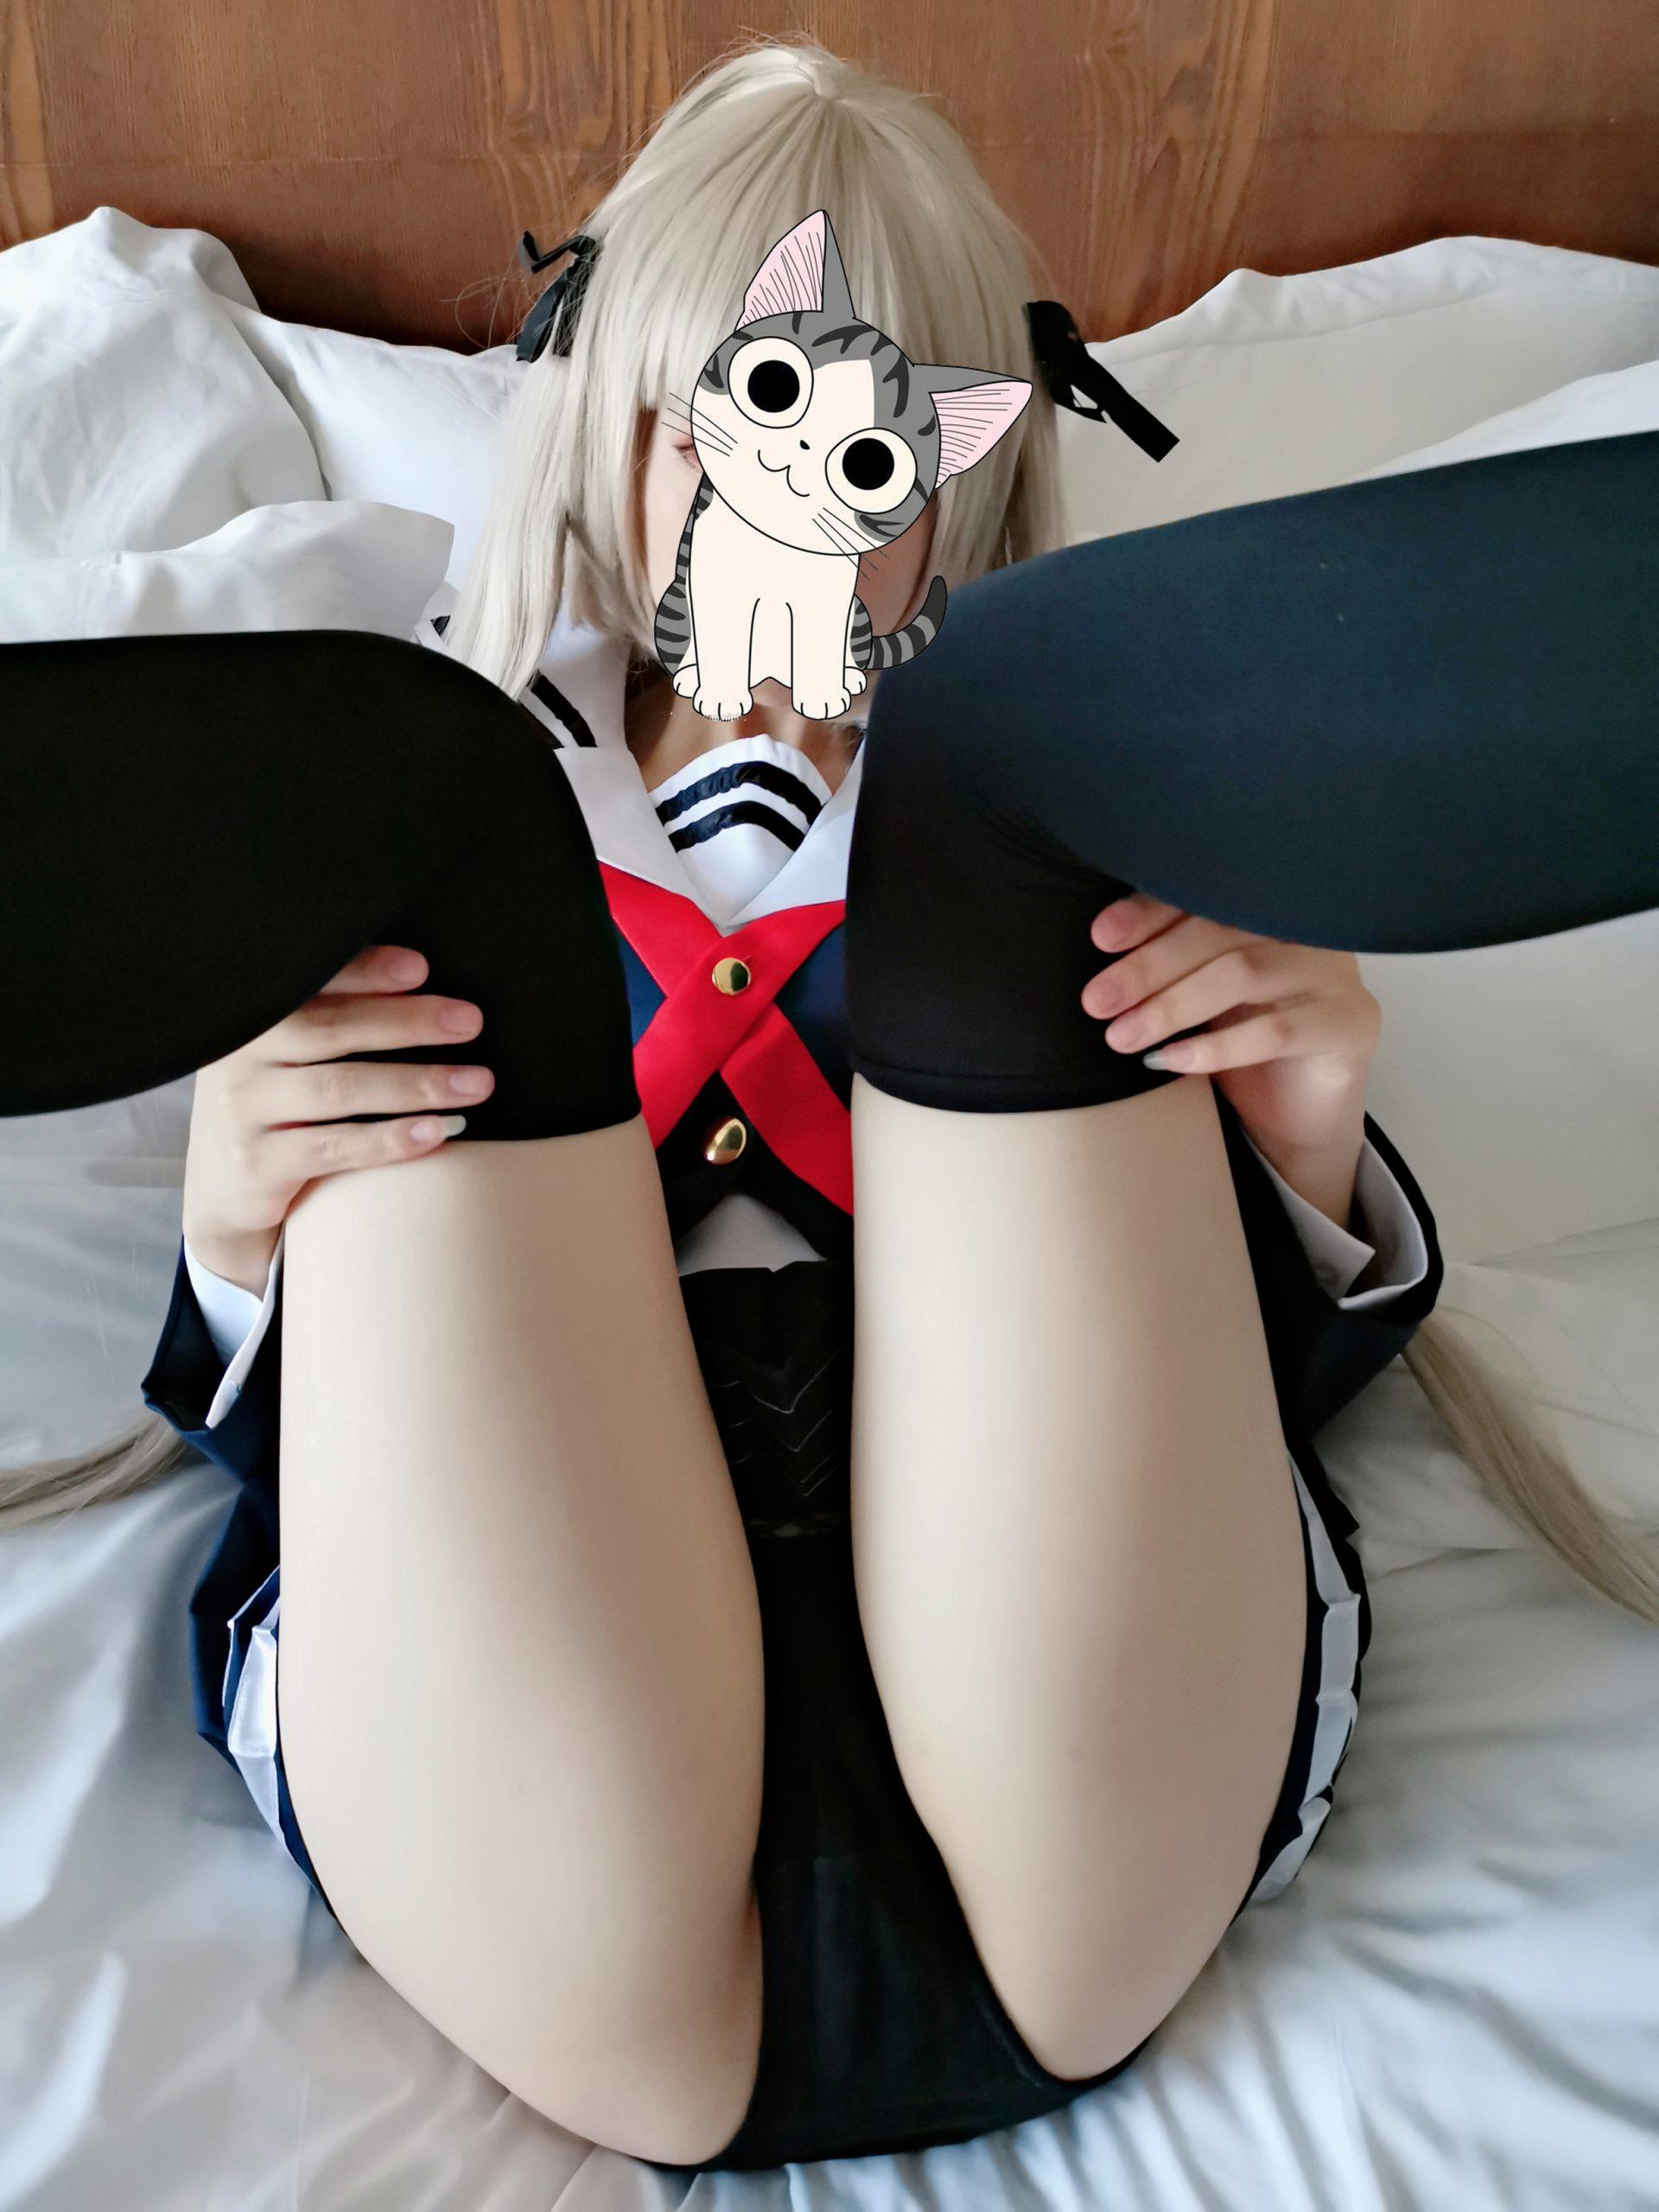 Cosplay福利 奈奈junana 全套福利过膝袜JK